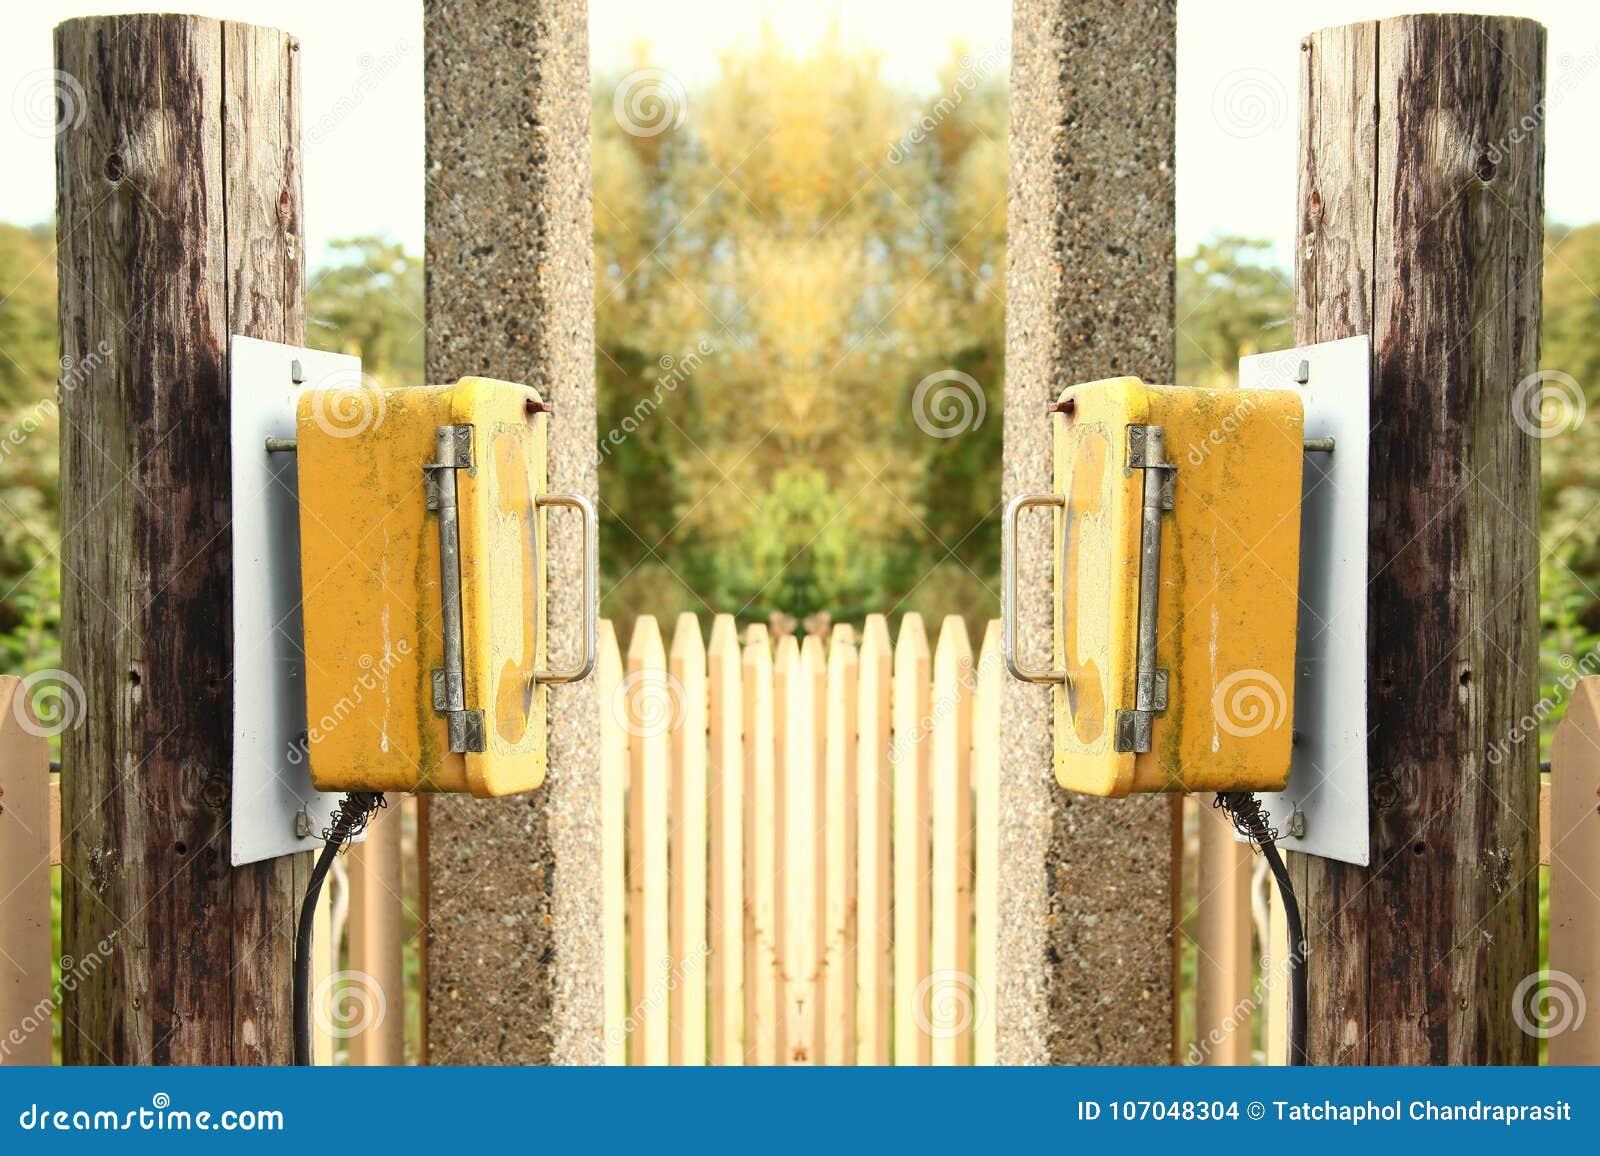 Telephone call box scene  stock photo  Image of railway